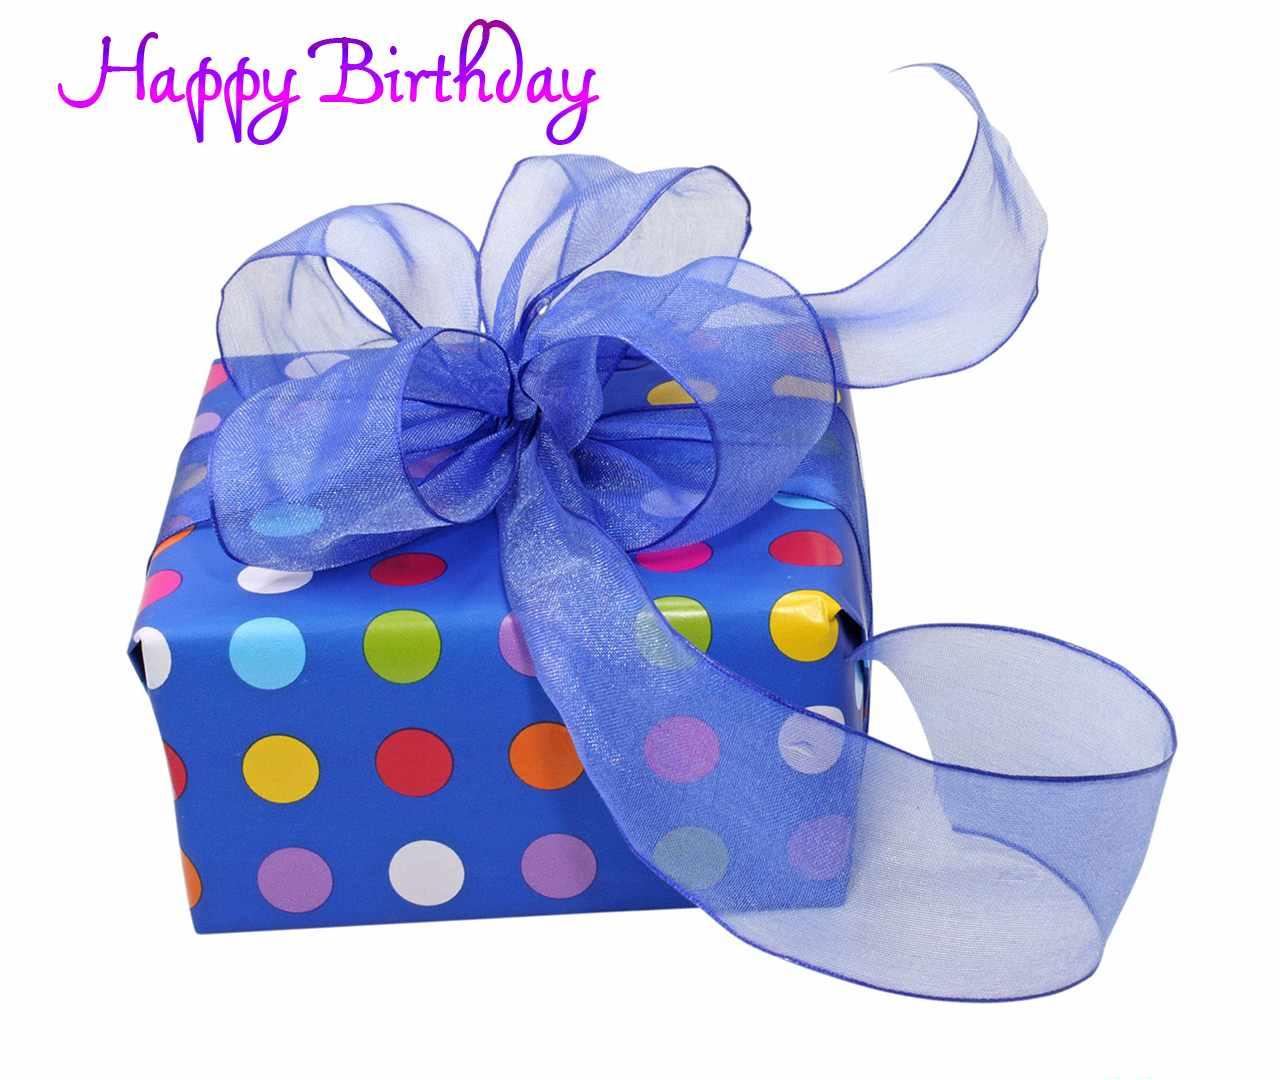 HD BIRTHDAY WALLPAPER : Birthday Greetings,Happy Birthday ...